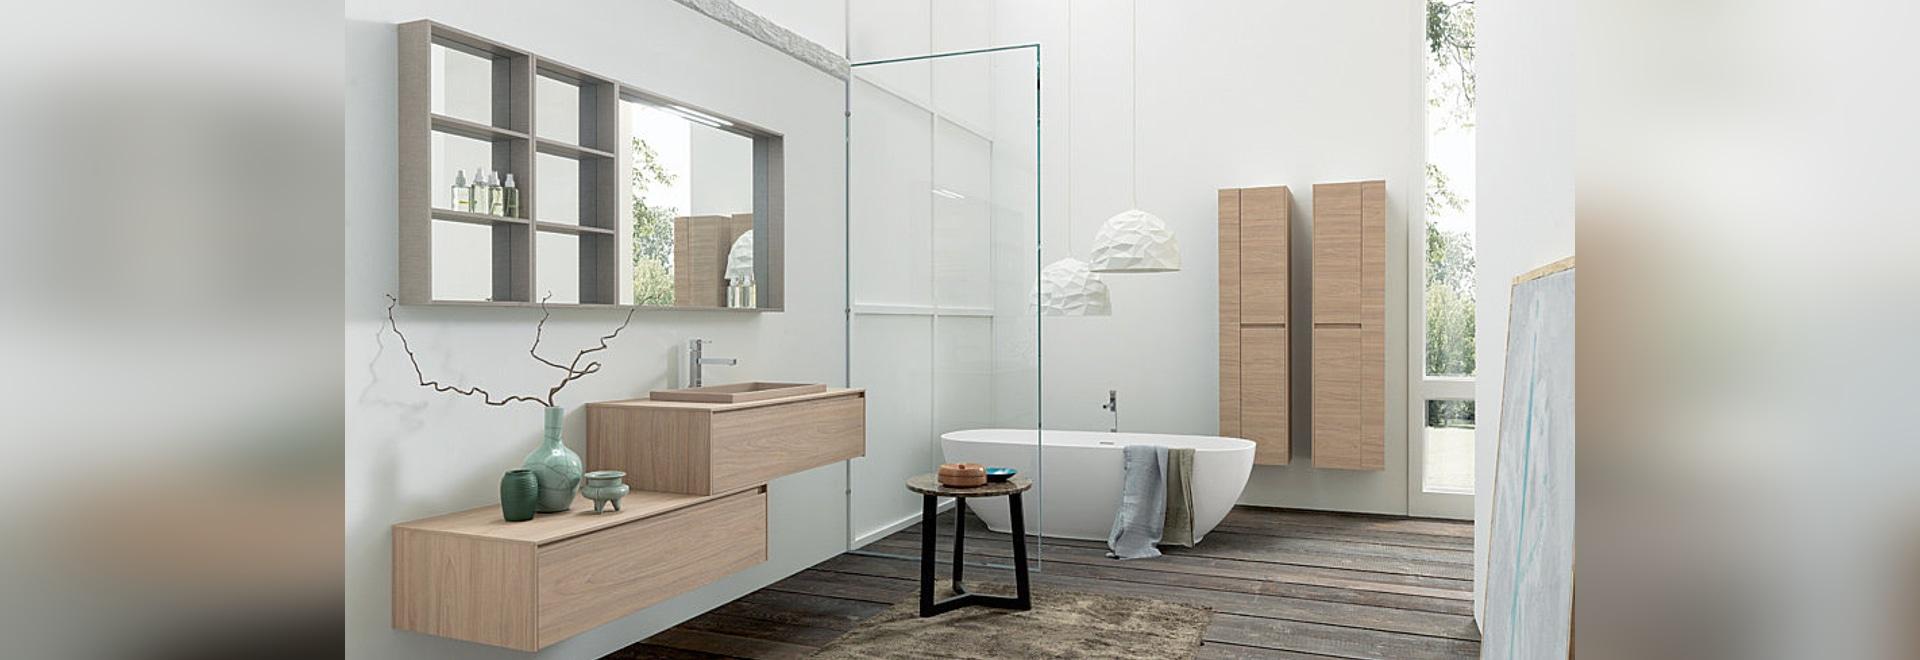 Contemporary bathroom: Tulle